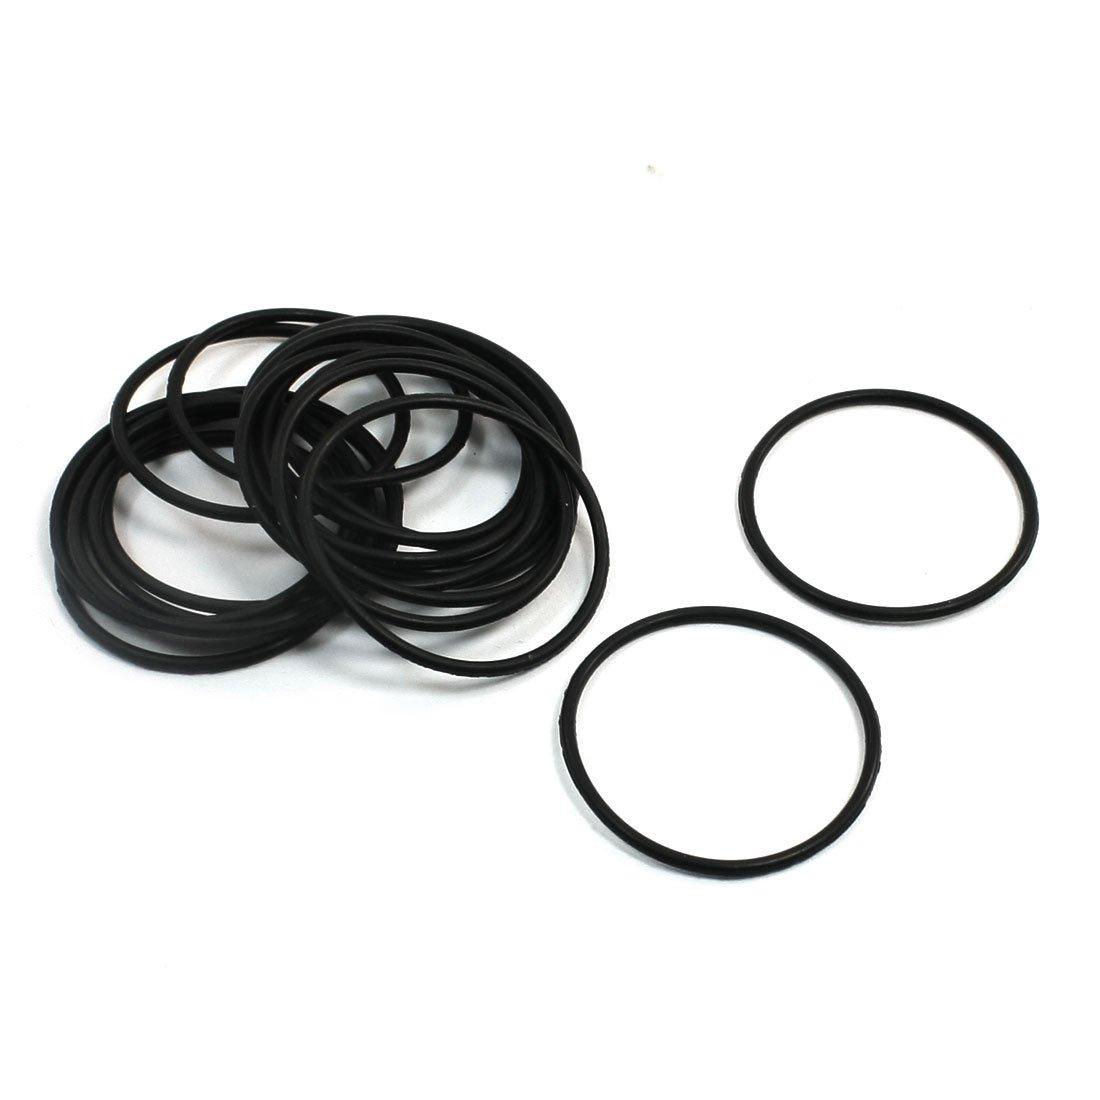 uxcell Nitrile Rubber O-Rings, 31mm OD 28mm ID 1.5mm Width, Metric Buna-N Sealing Gasket, Pack of 20